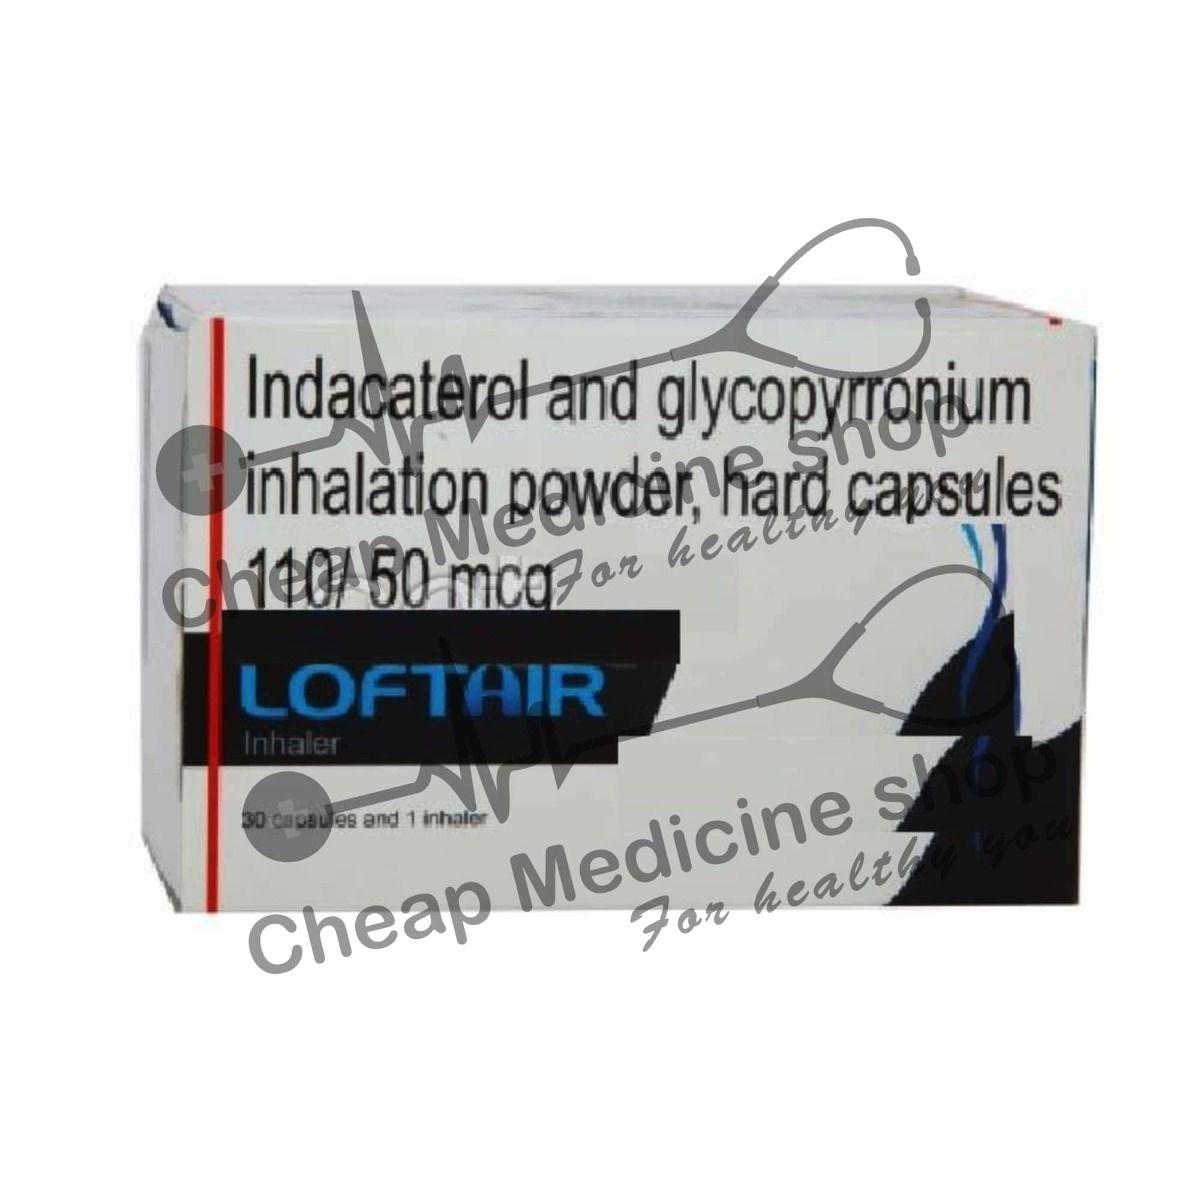 Loftair Inhaler 20 Mcg+20 Mcg   Indacaterol+Glycopyrrolate